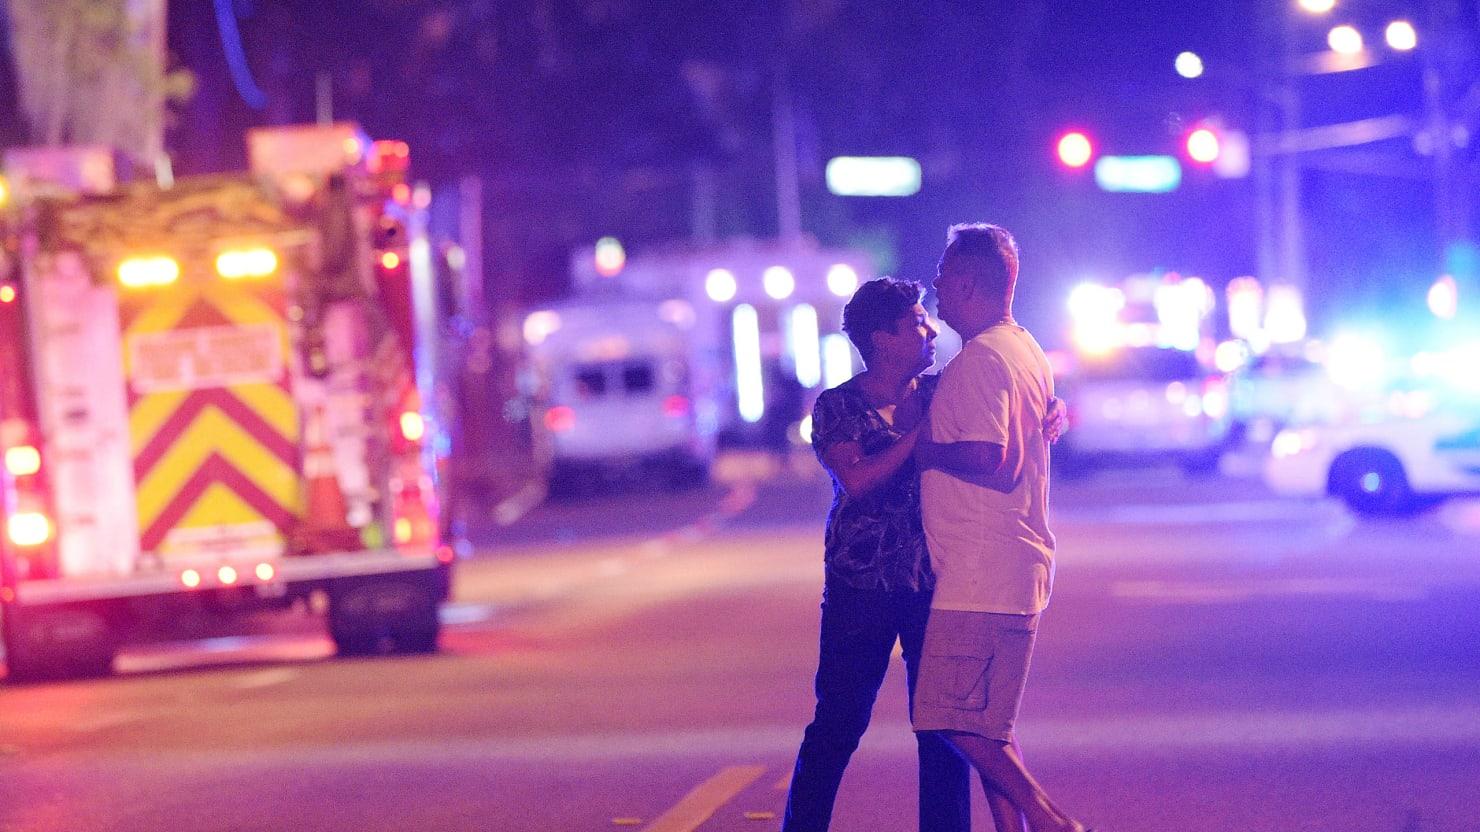 Don't Let Madmen Like the Orlando Shooter Hijack Muhammad Ali's Legacy